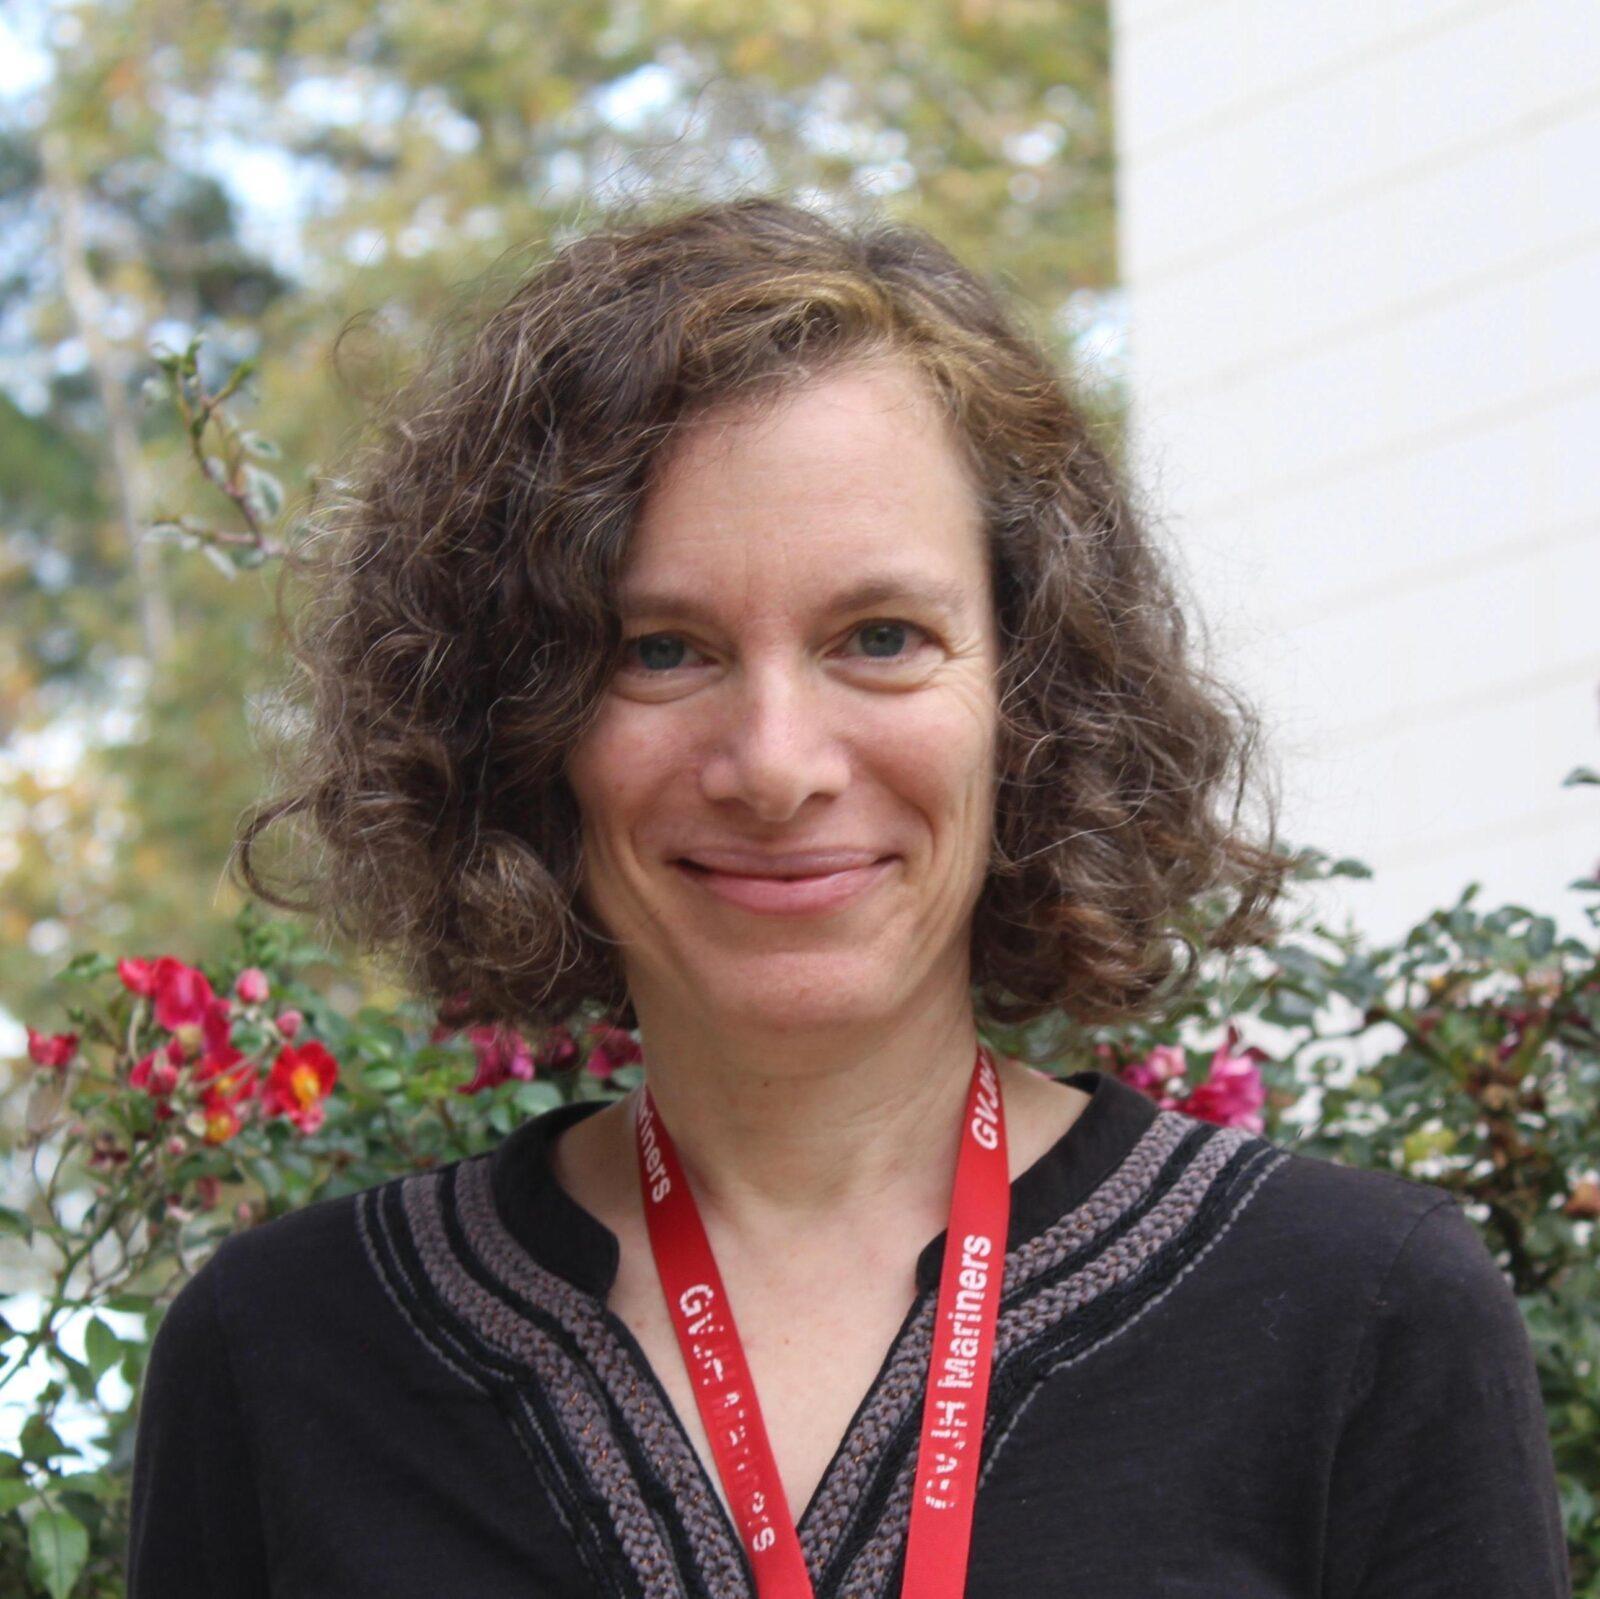 Carolyn Ross Joins Santa Barbara Education Foundation's Board of Directors